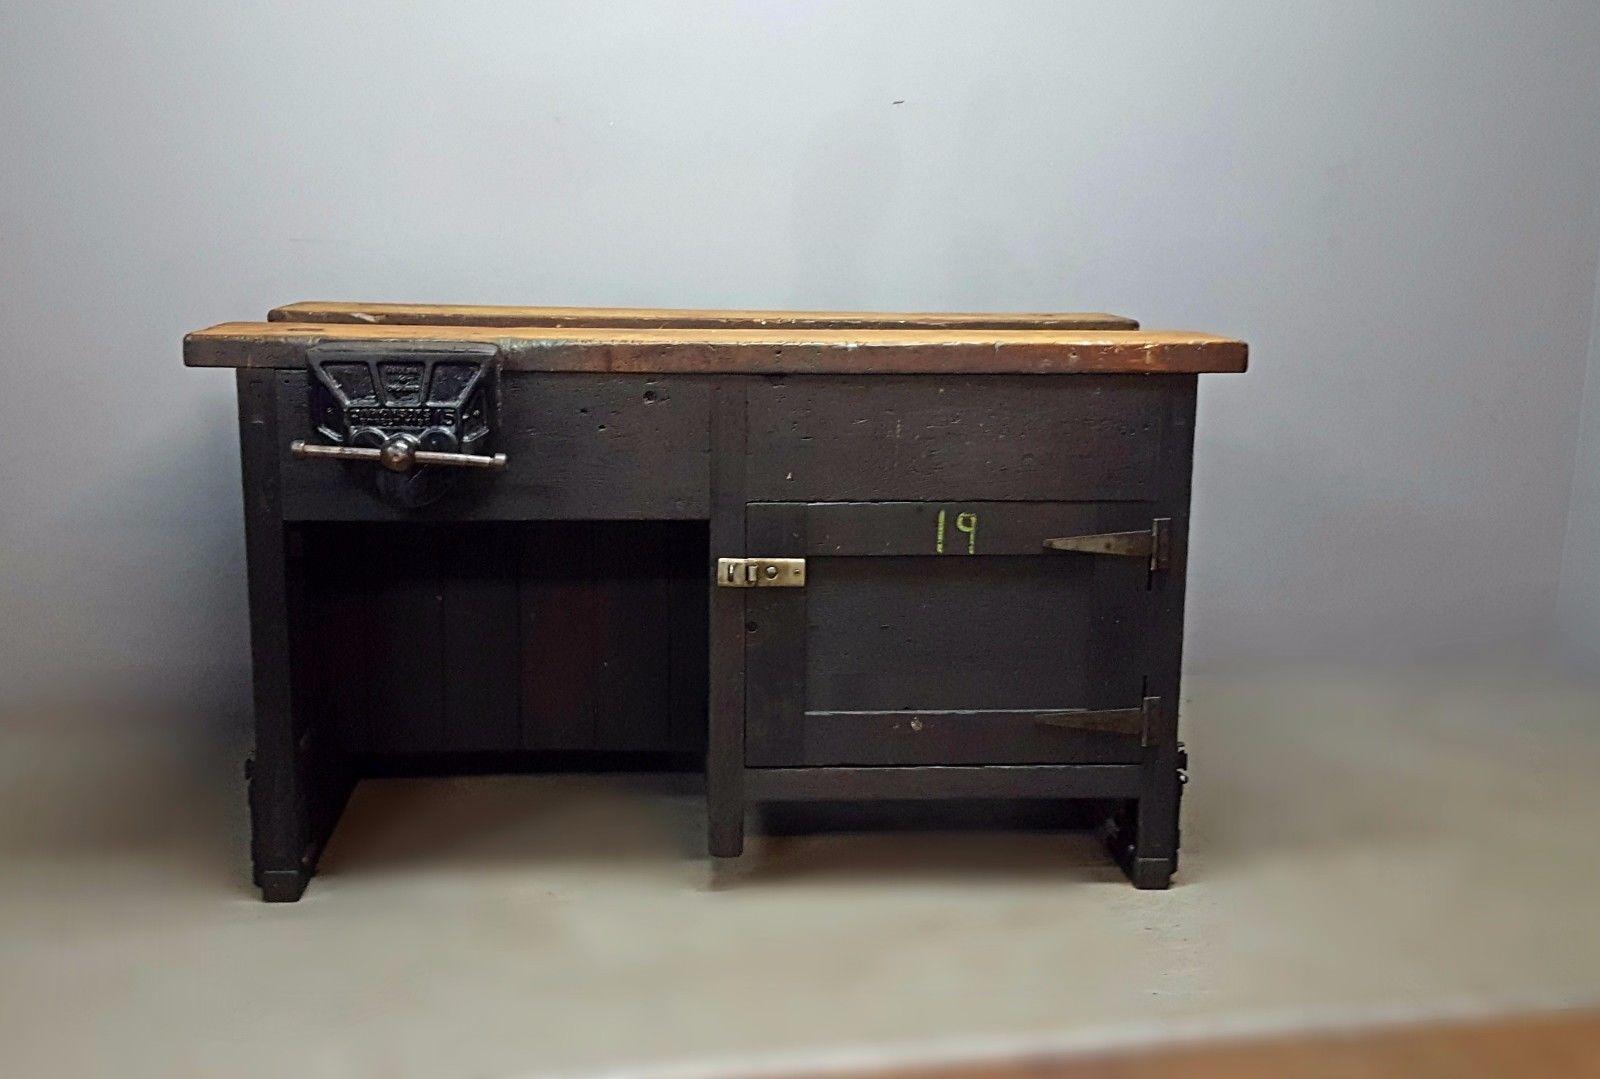 Marvelous Vintage Retro Industrial School Workbench Excellent Pabps2019 Chair Design Images Pabps2019Com